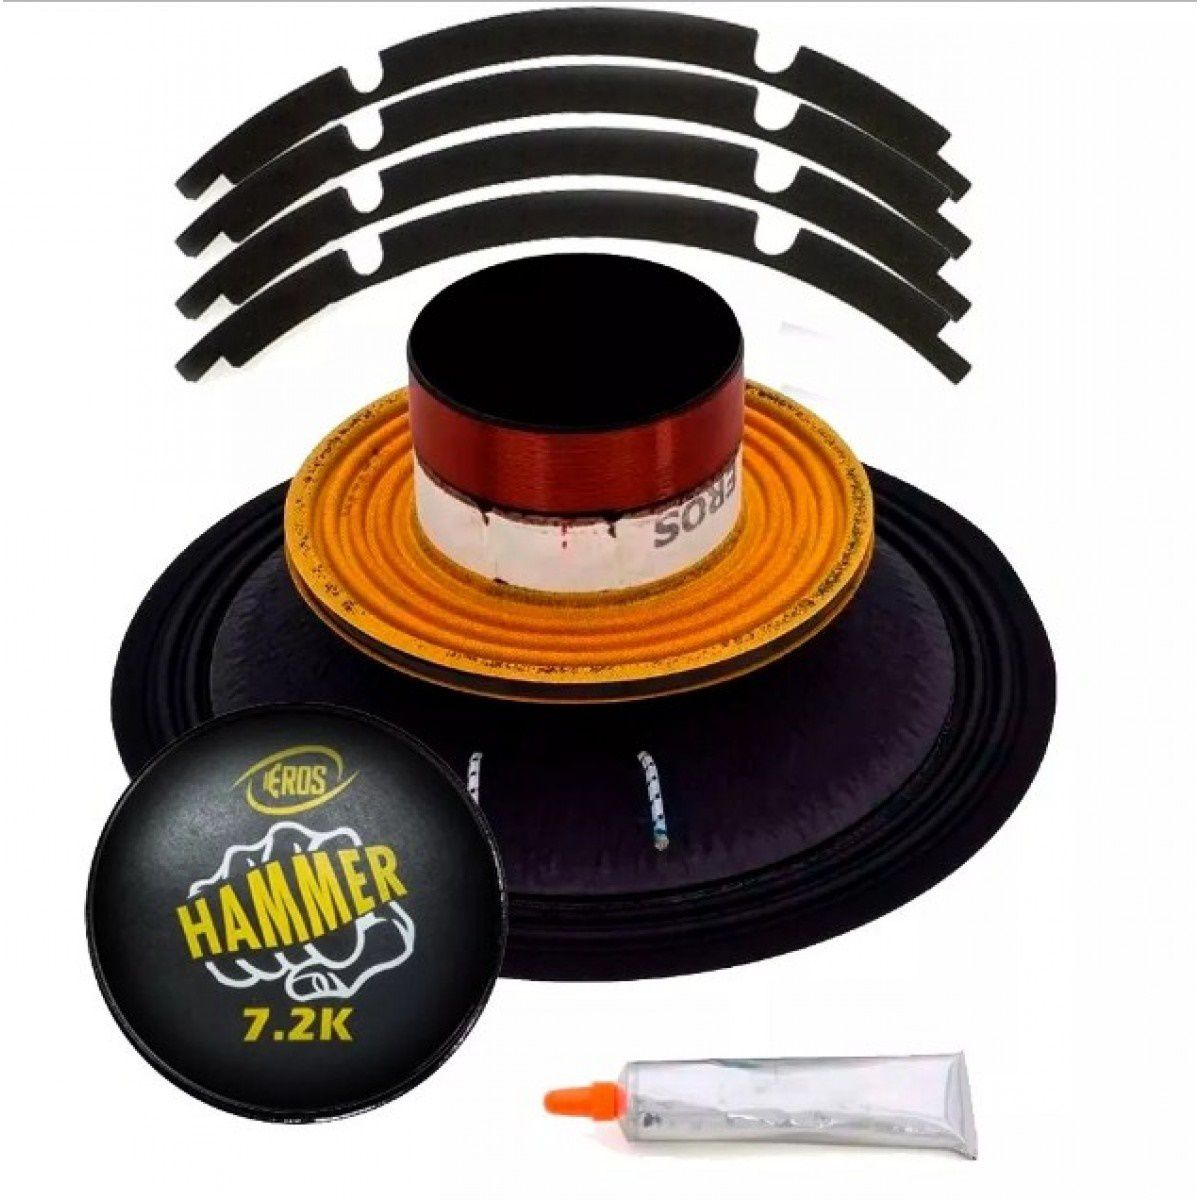 "Kit Reparo para Alto Falante Eros 12"" E12 Hammer 7.2K 3600W Rms 4 Ohms"